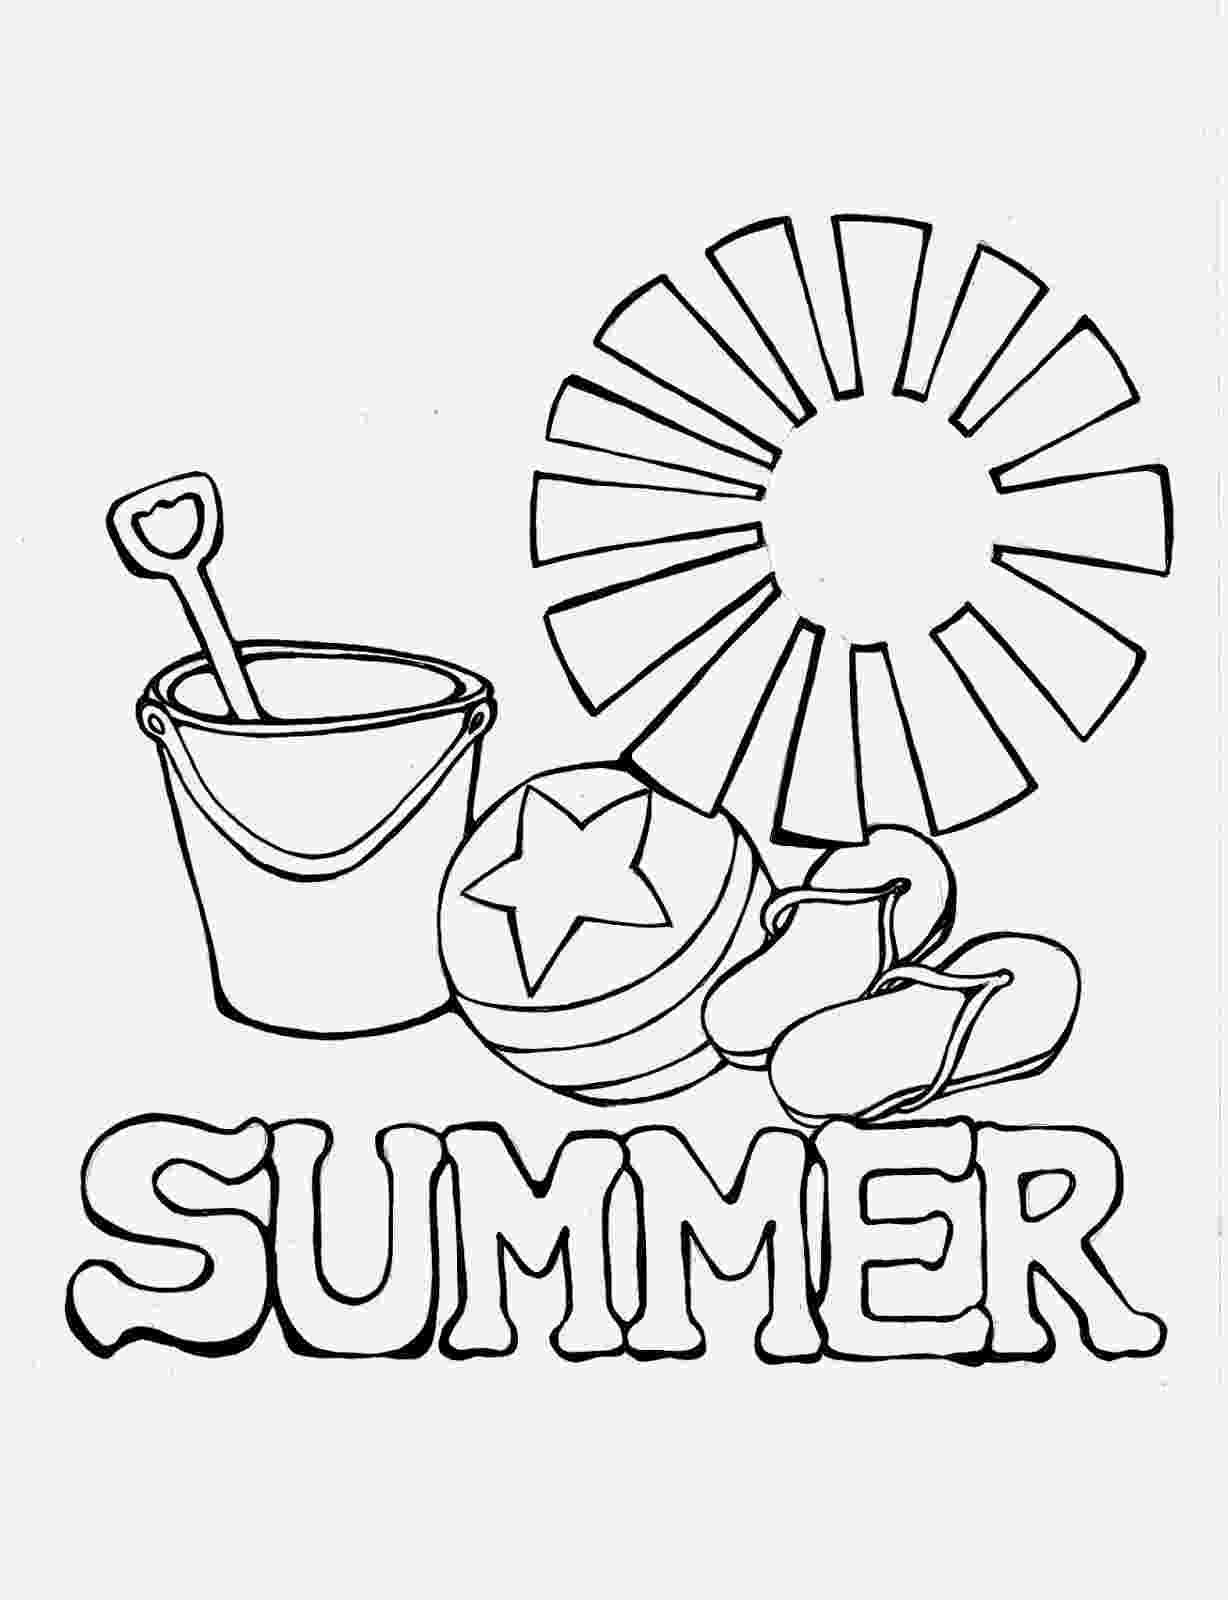 summer coloring page wwwprekandksharingblogspotcom summer page coloring